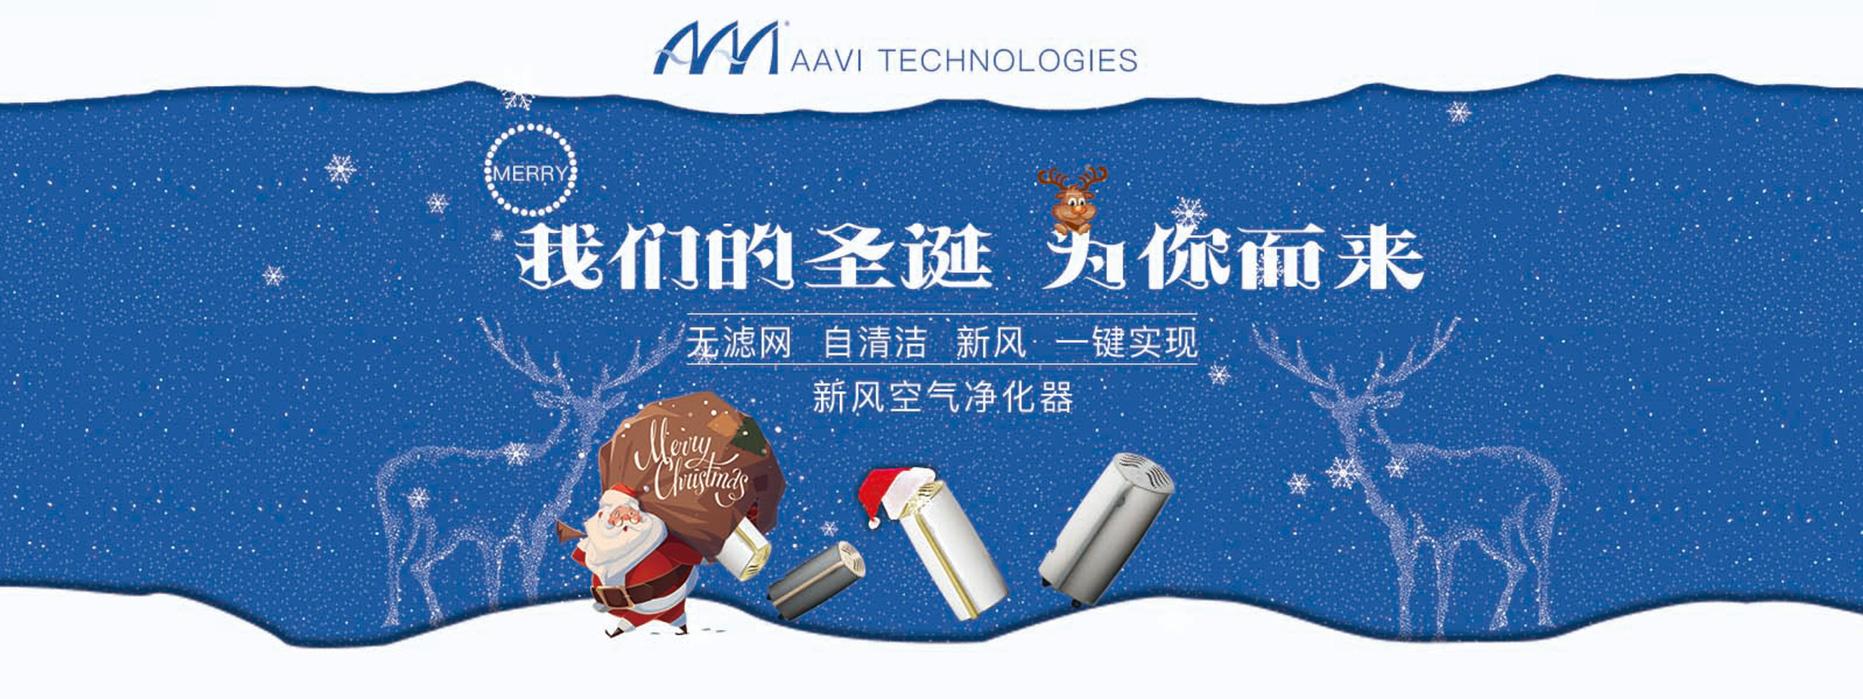 AAVI雅威驻足北京SKP给您不一样的圣诞体验!